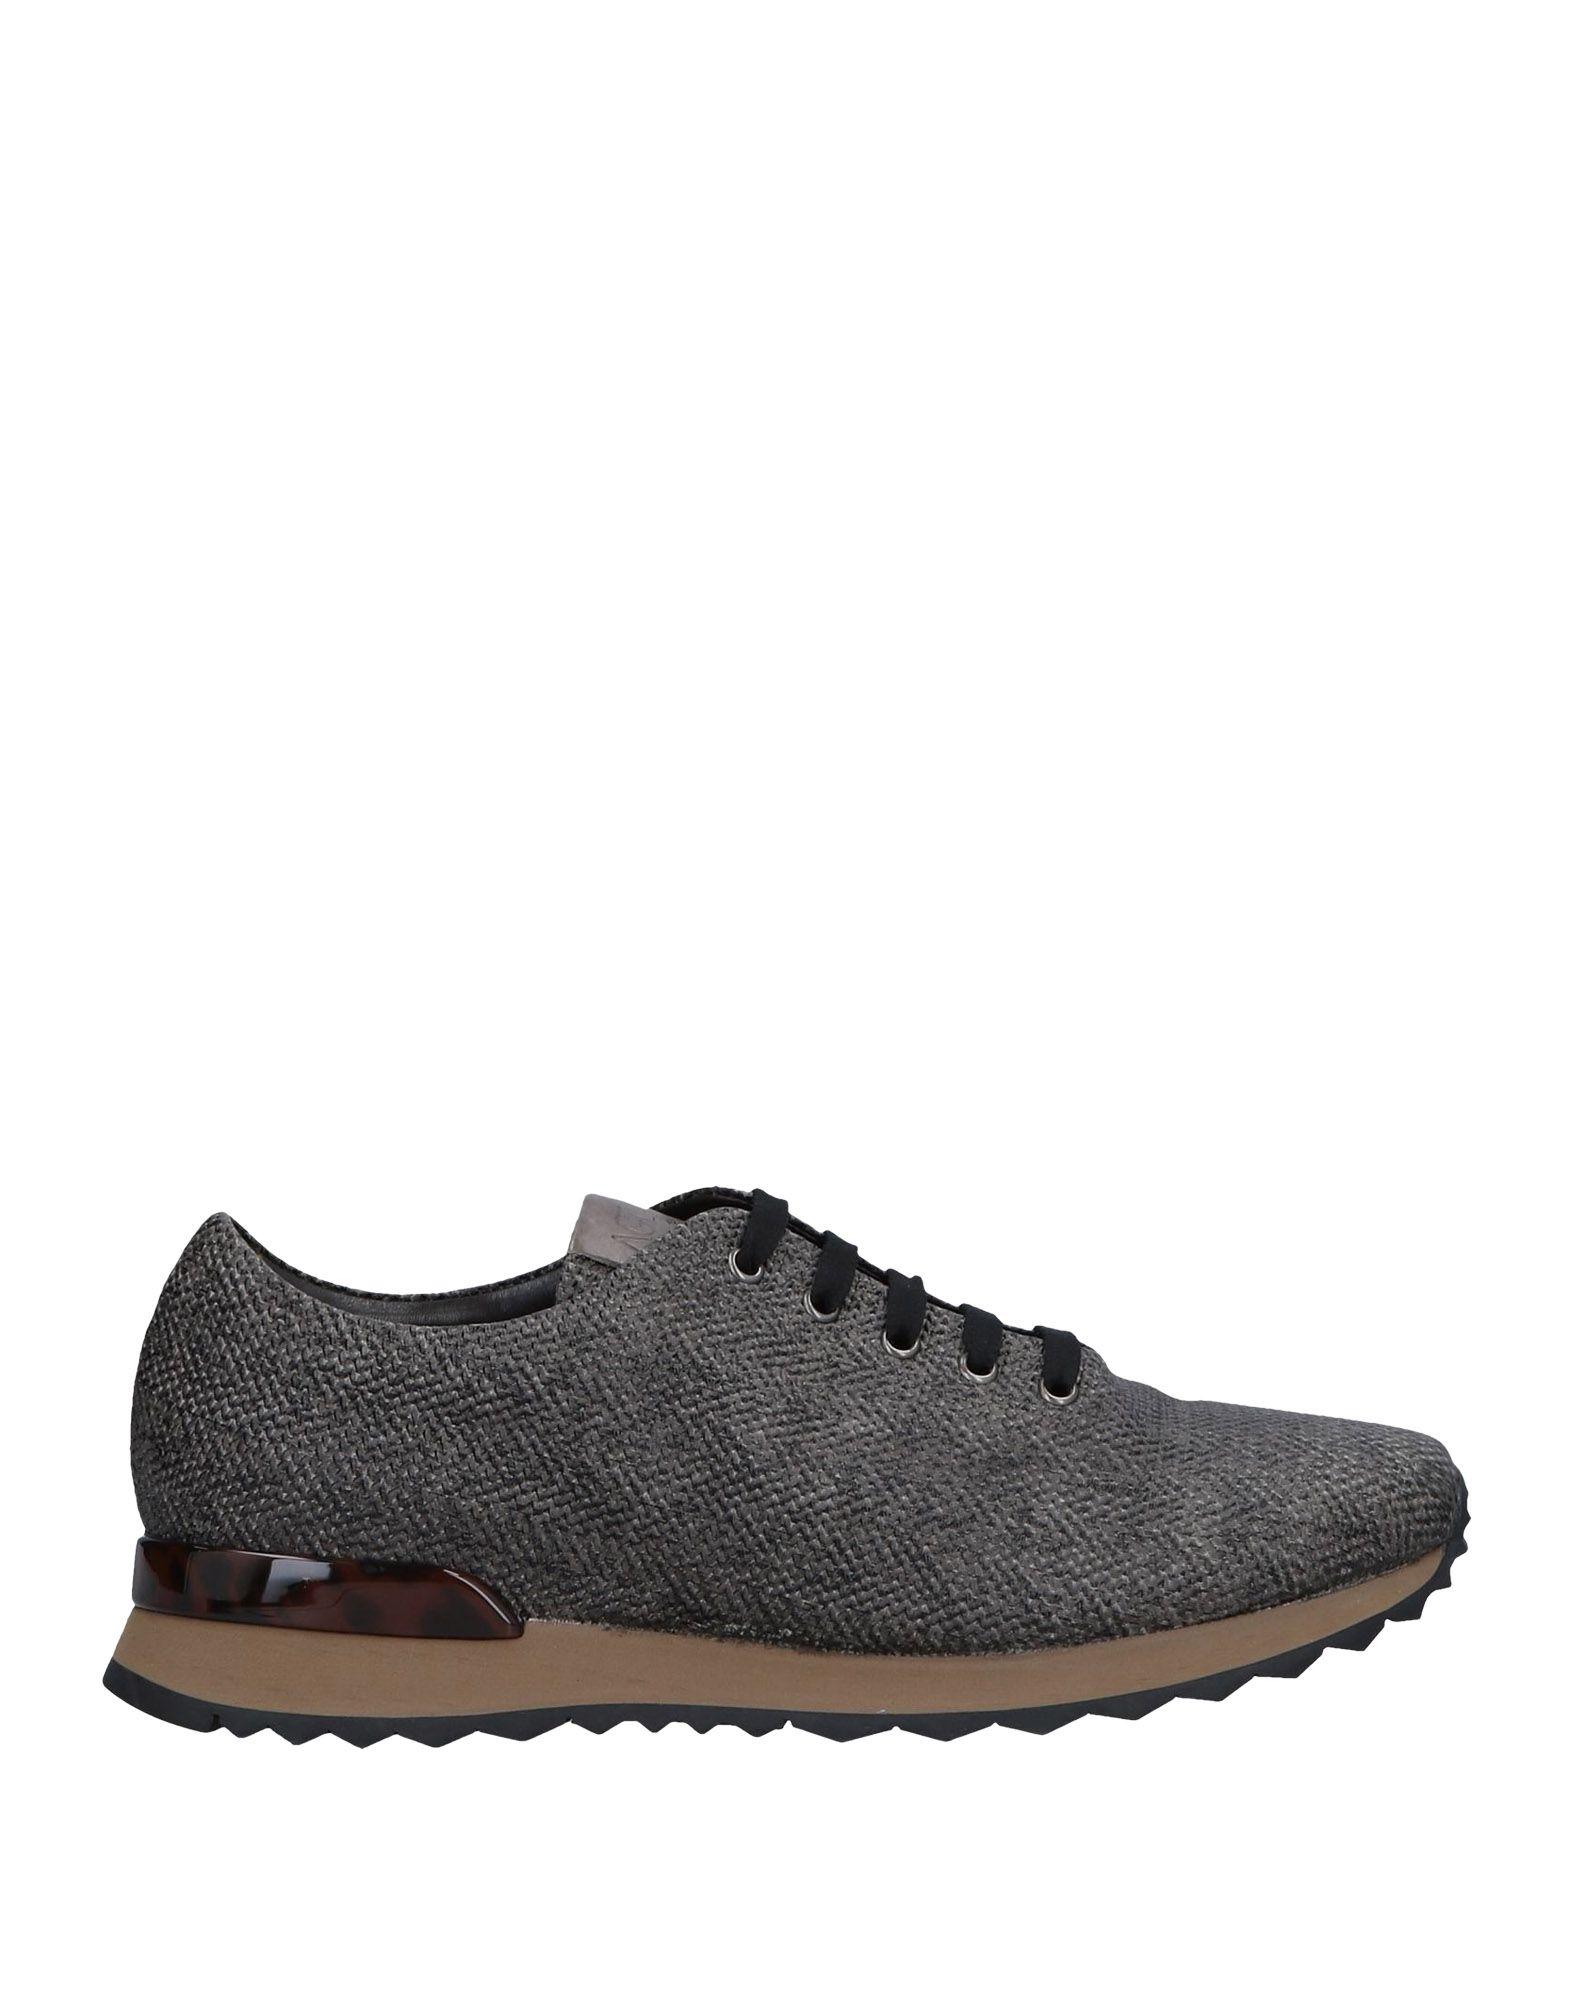 Agl Attilio Giusti Leombruni Sneakers Damen  11523057TFGut aussehende strapazierfähige Schuhe